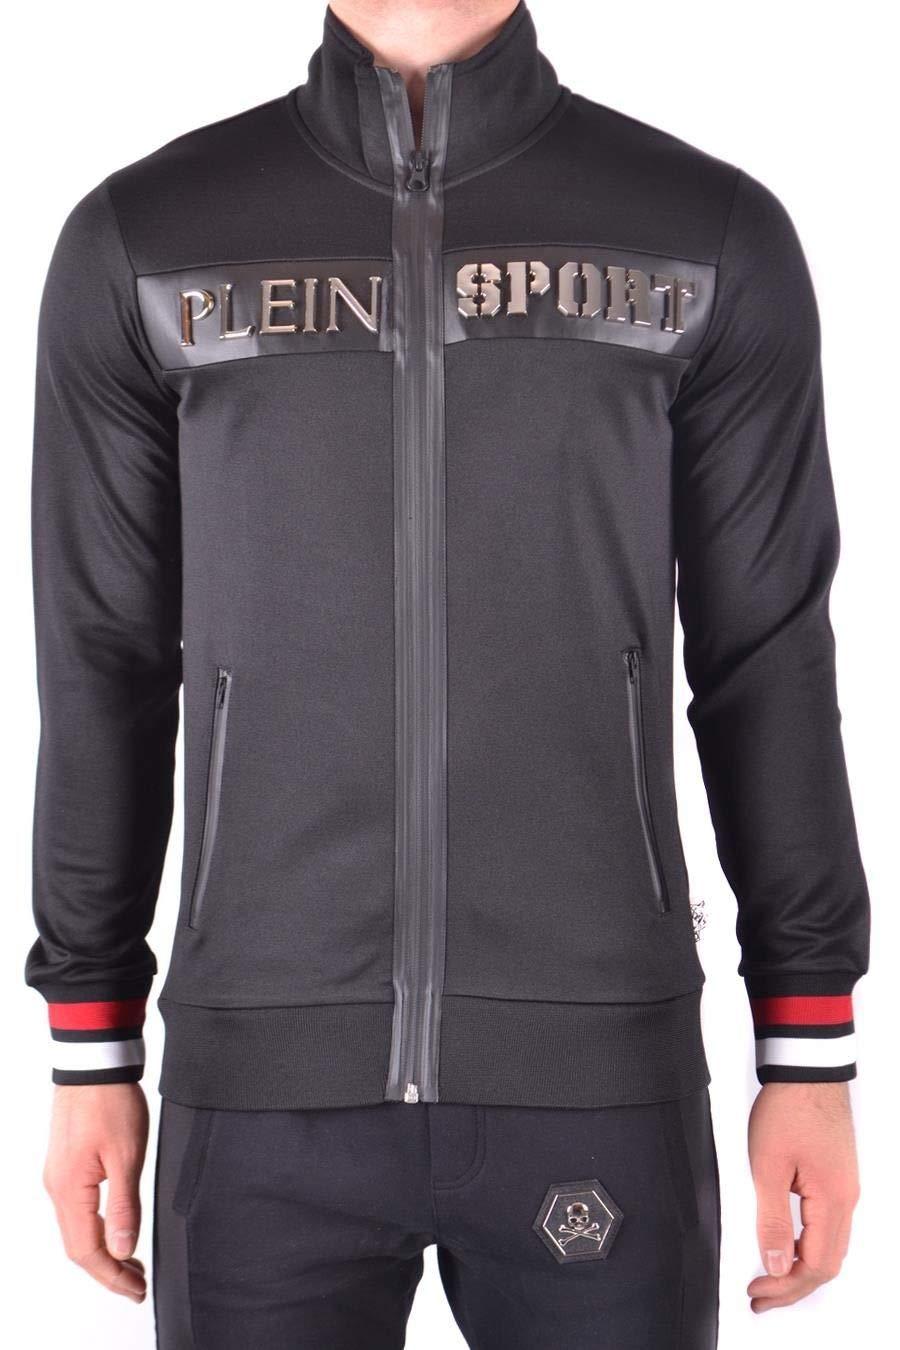 Brand Size L PLEIN SPORT Men's MJB0338SJO001N02 Black Polyester Jacket